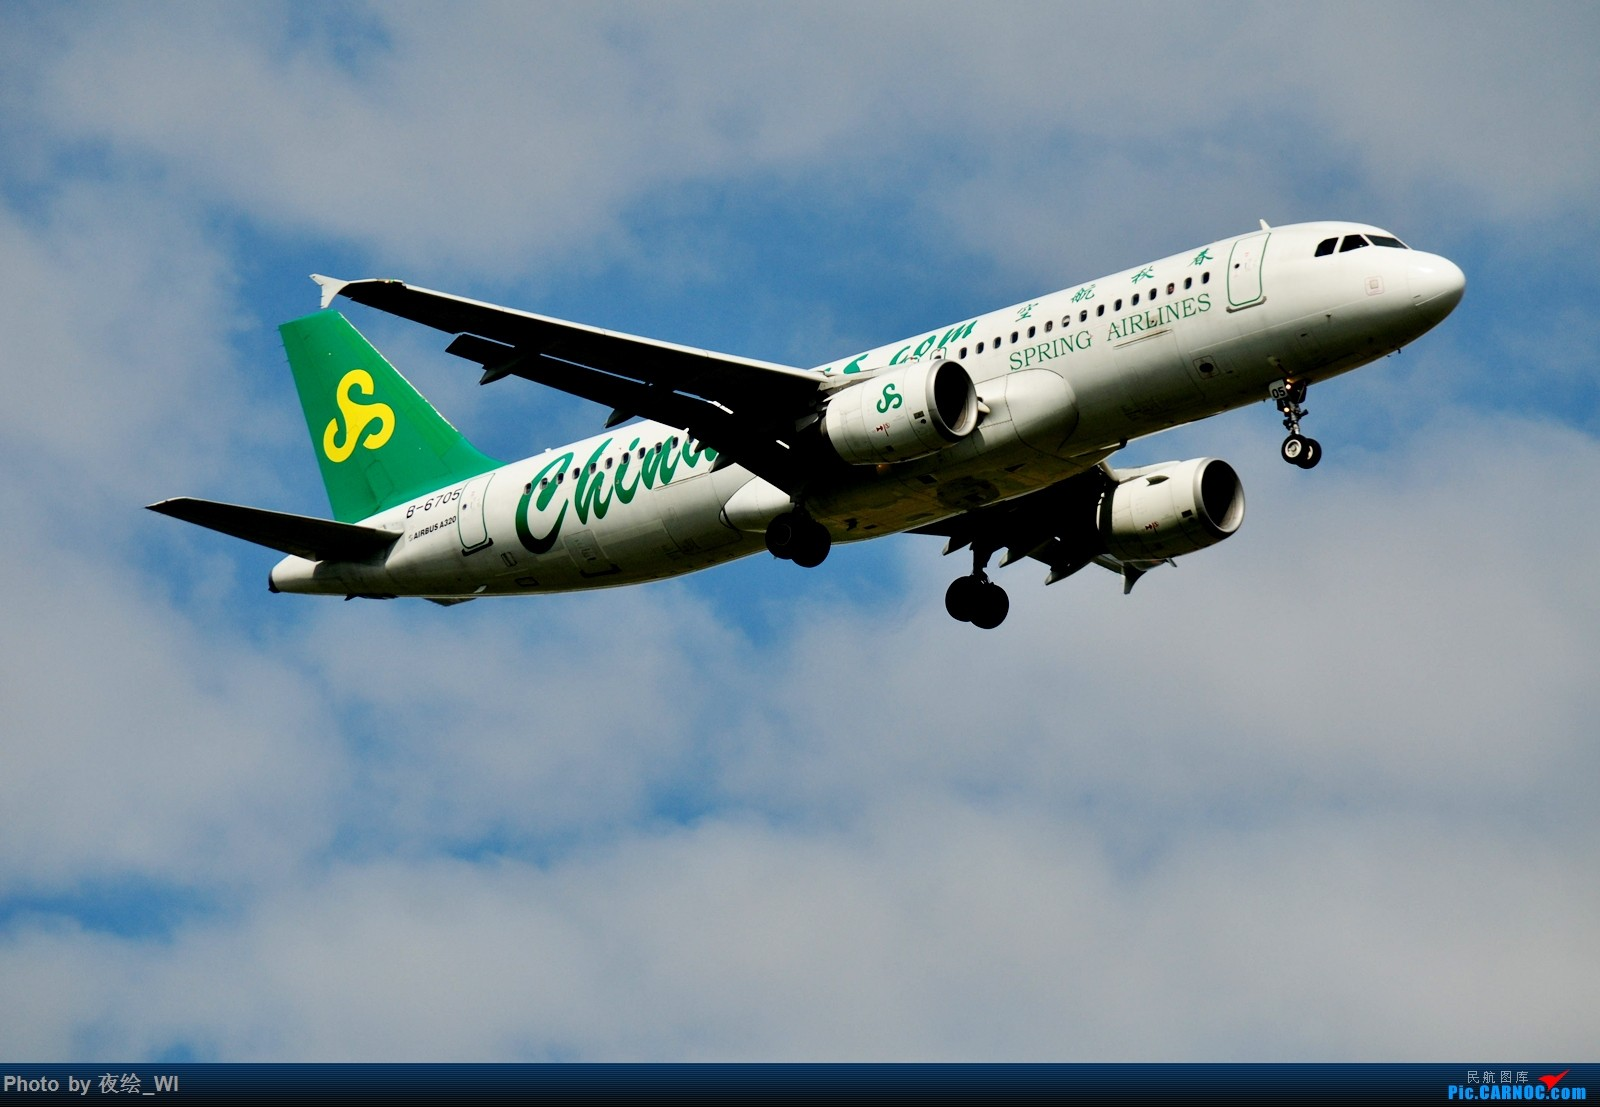 Re:[原创]【PVG】不只守着NKG,国庆疯狂拍机之浦东行,天空美得简直不像话! AIRBUS A320-200 B-6705 中国上海浦东国际机场